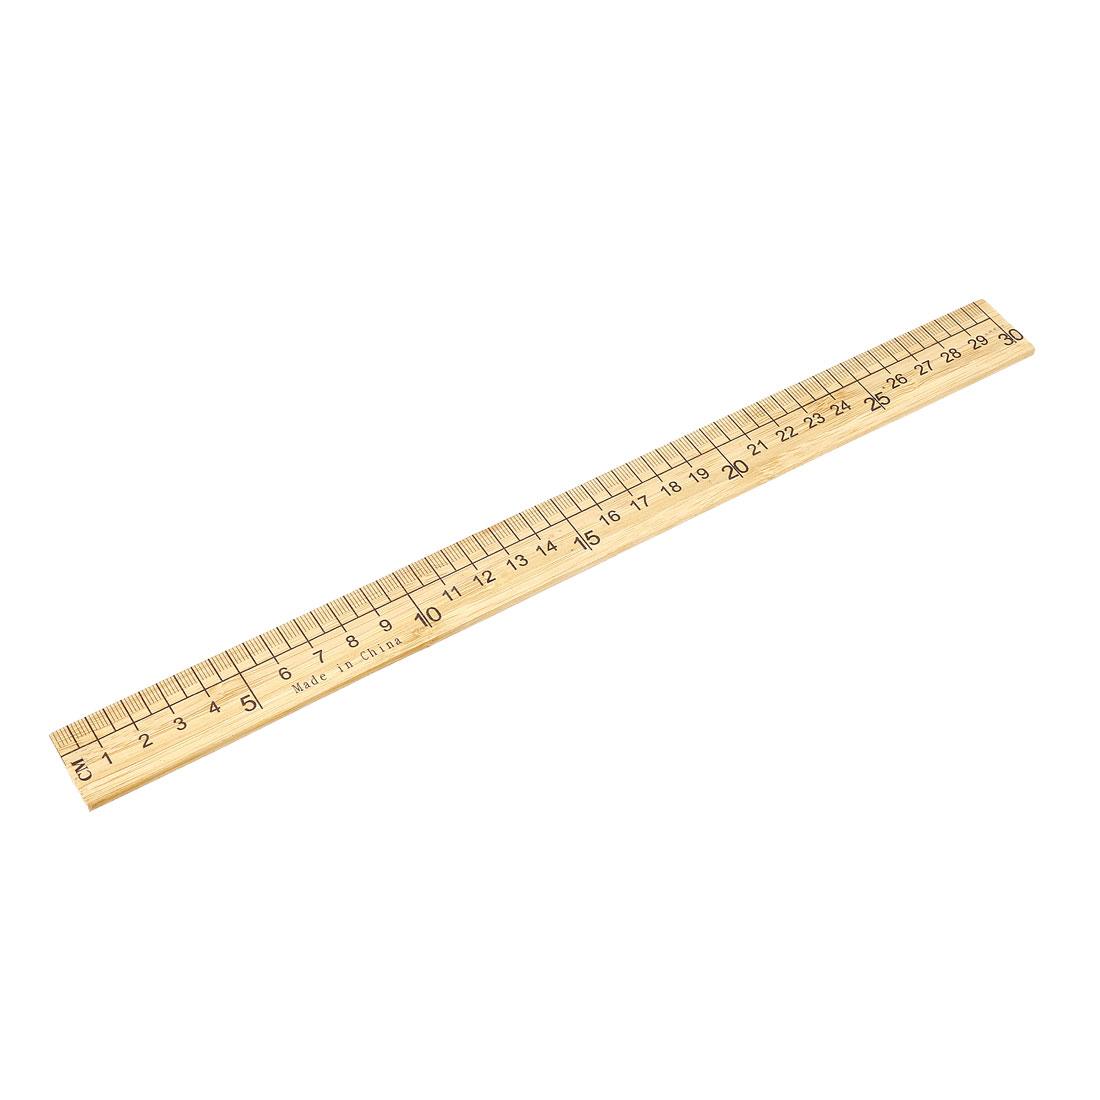 Straight Ruler 300mm 12 Inch Metric Measuring Tool Wood